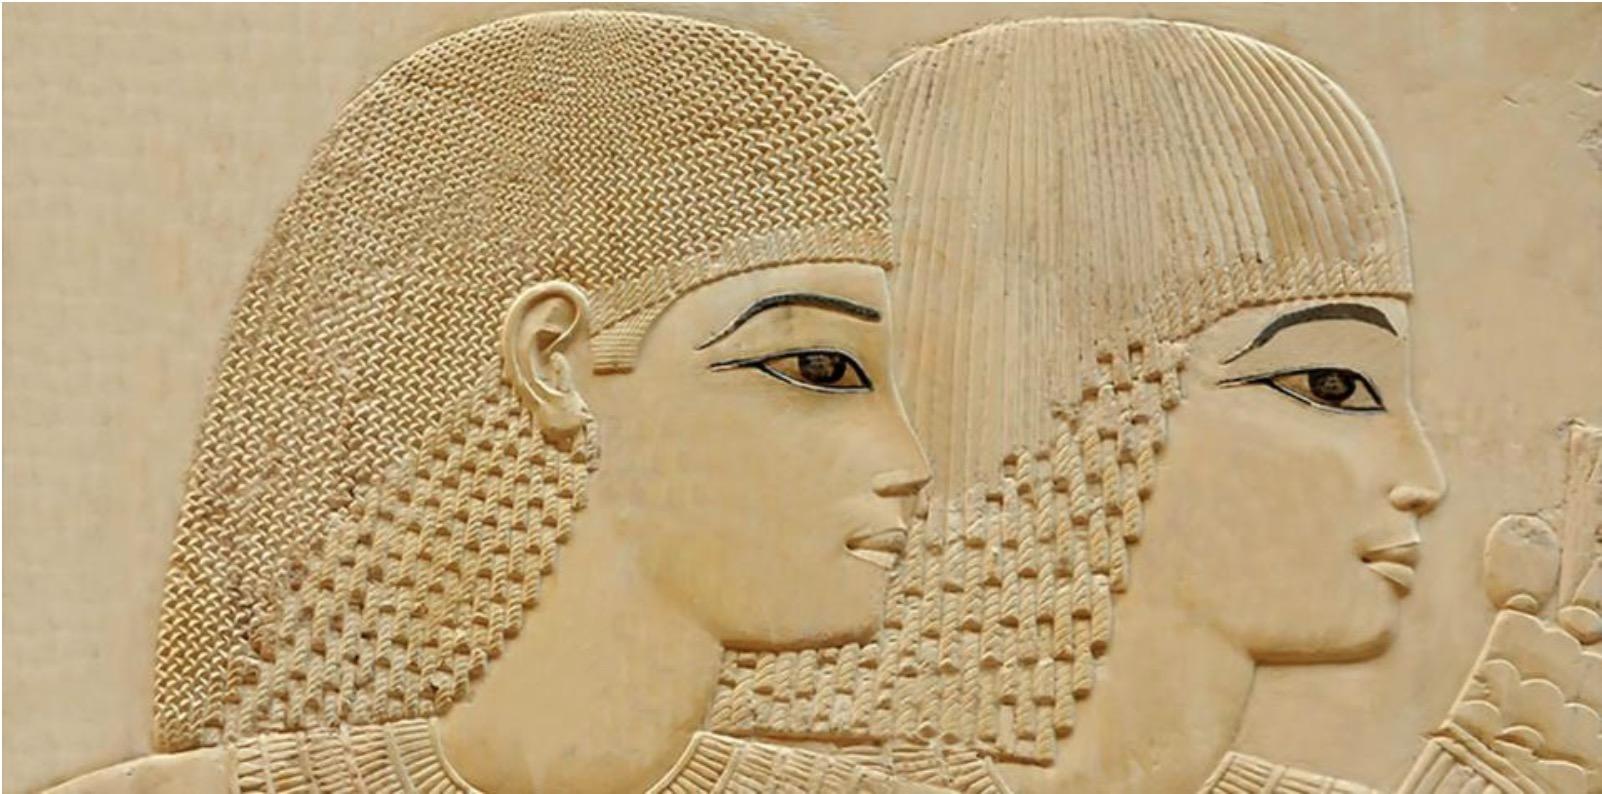 egypte ancienne-pilosité-piloupilou